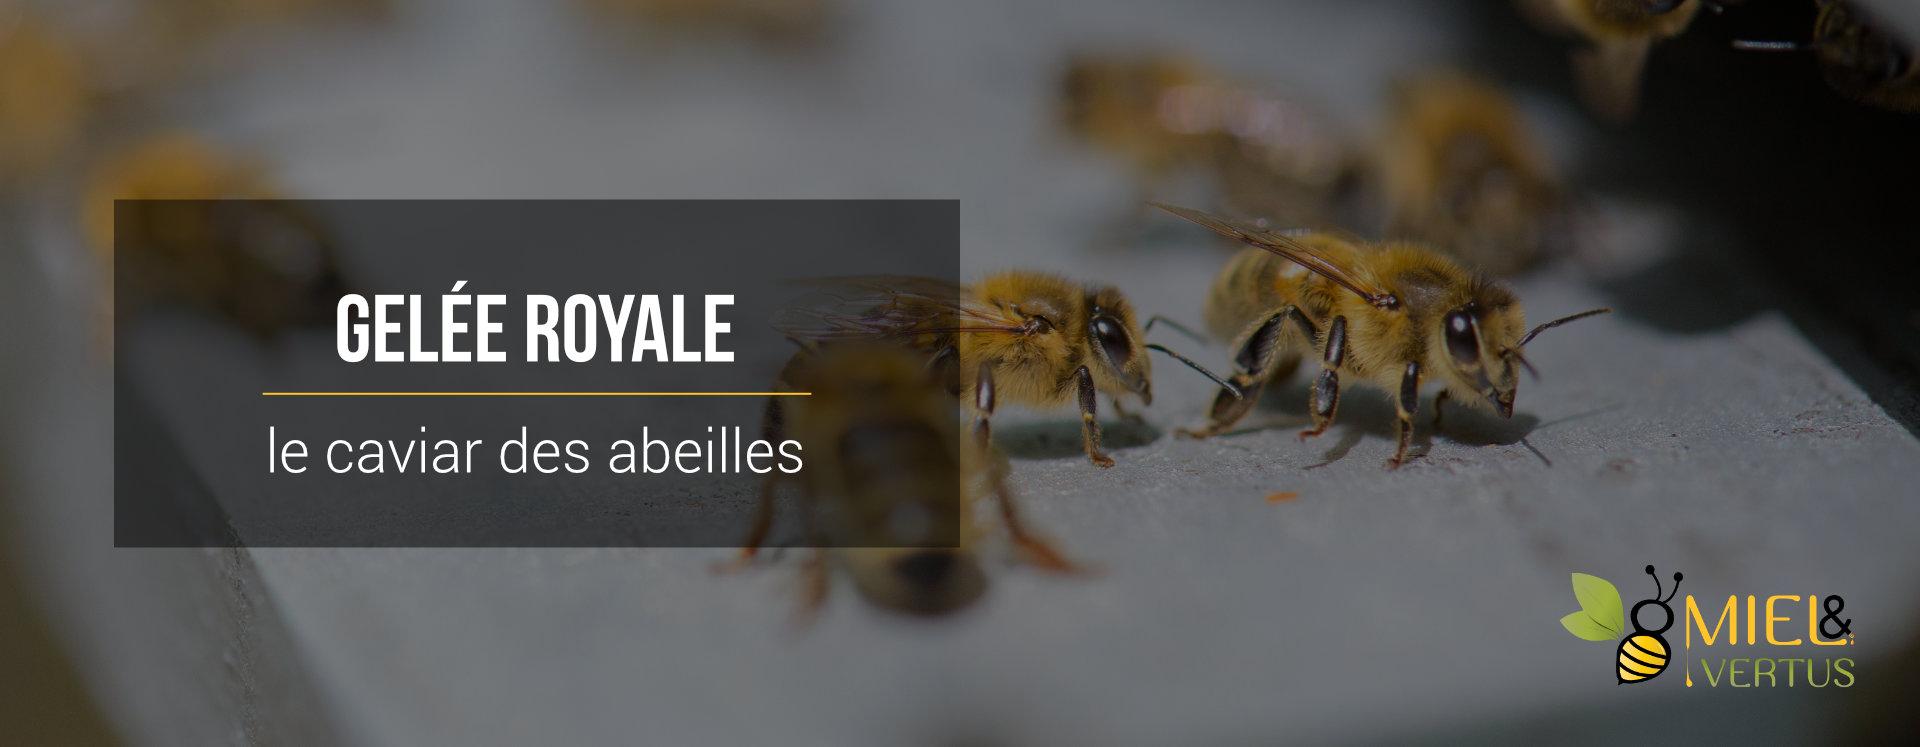 gelee-royale-caviar-abeilles